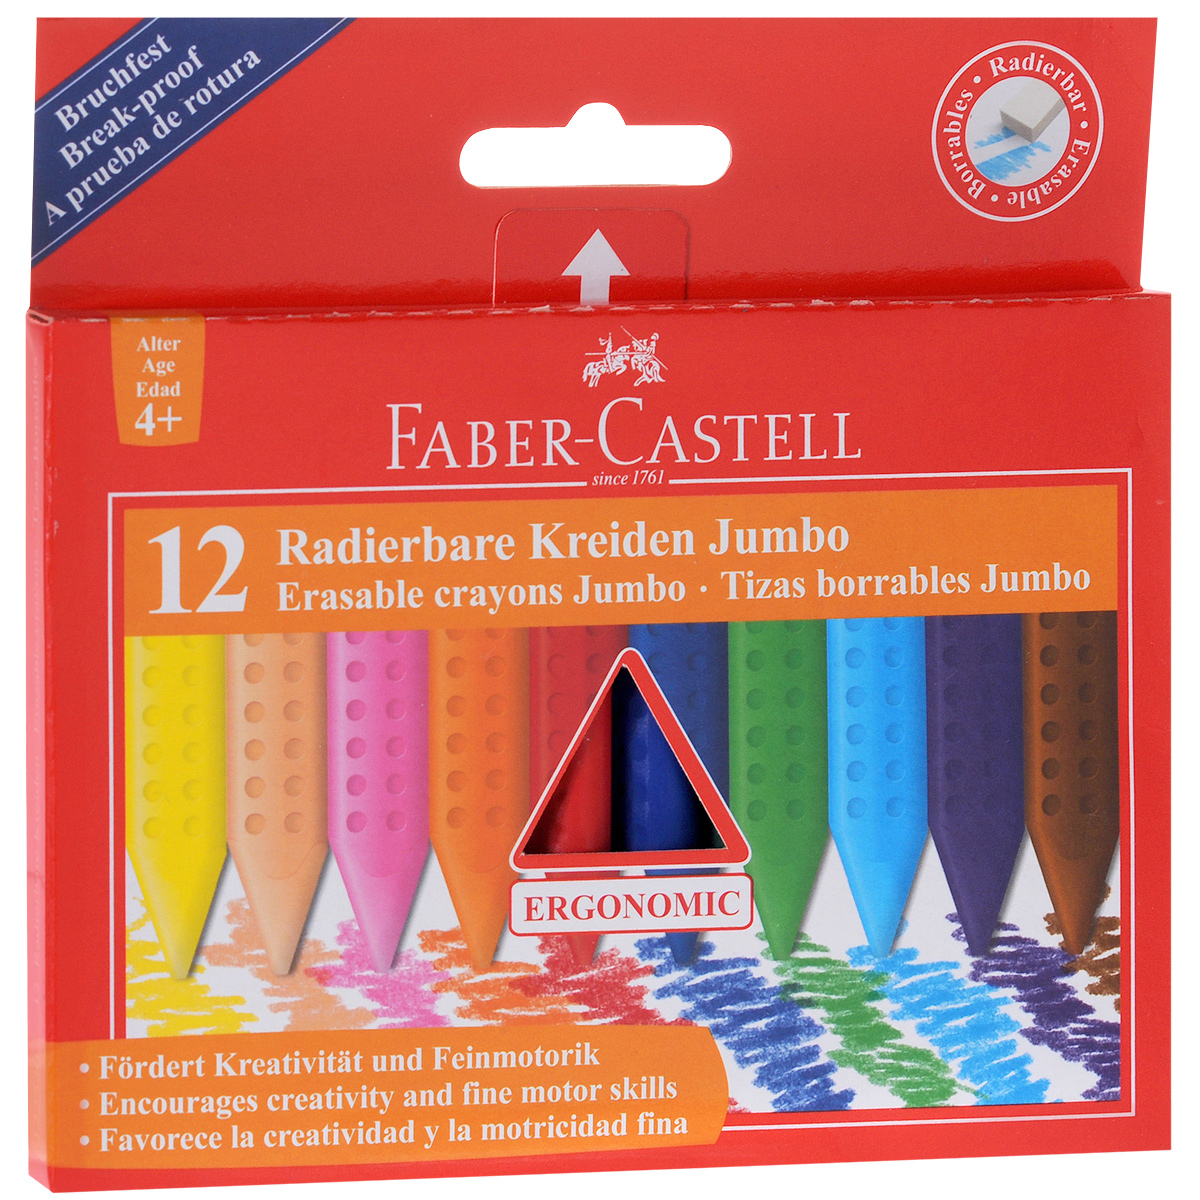 Восковые мелки Faber-Castell Radierbare Kreiden Jumbo, стирающиеся, 12 цветов faber castell восковые карандаши клоун 24 цвета